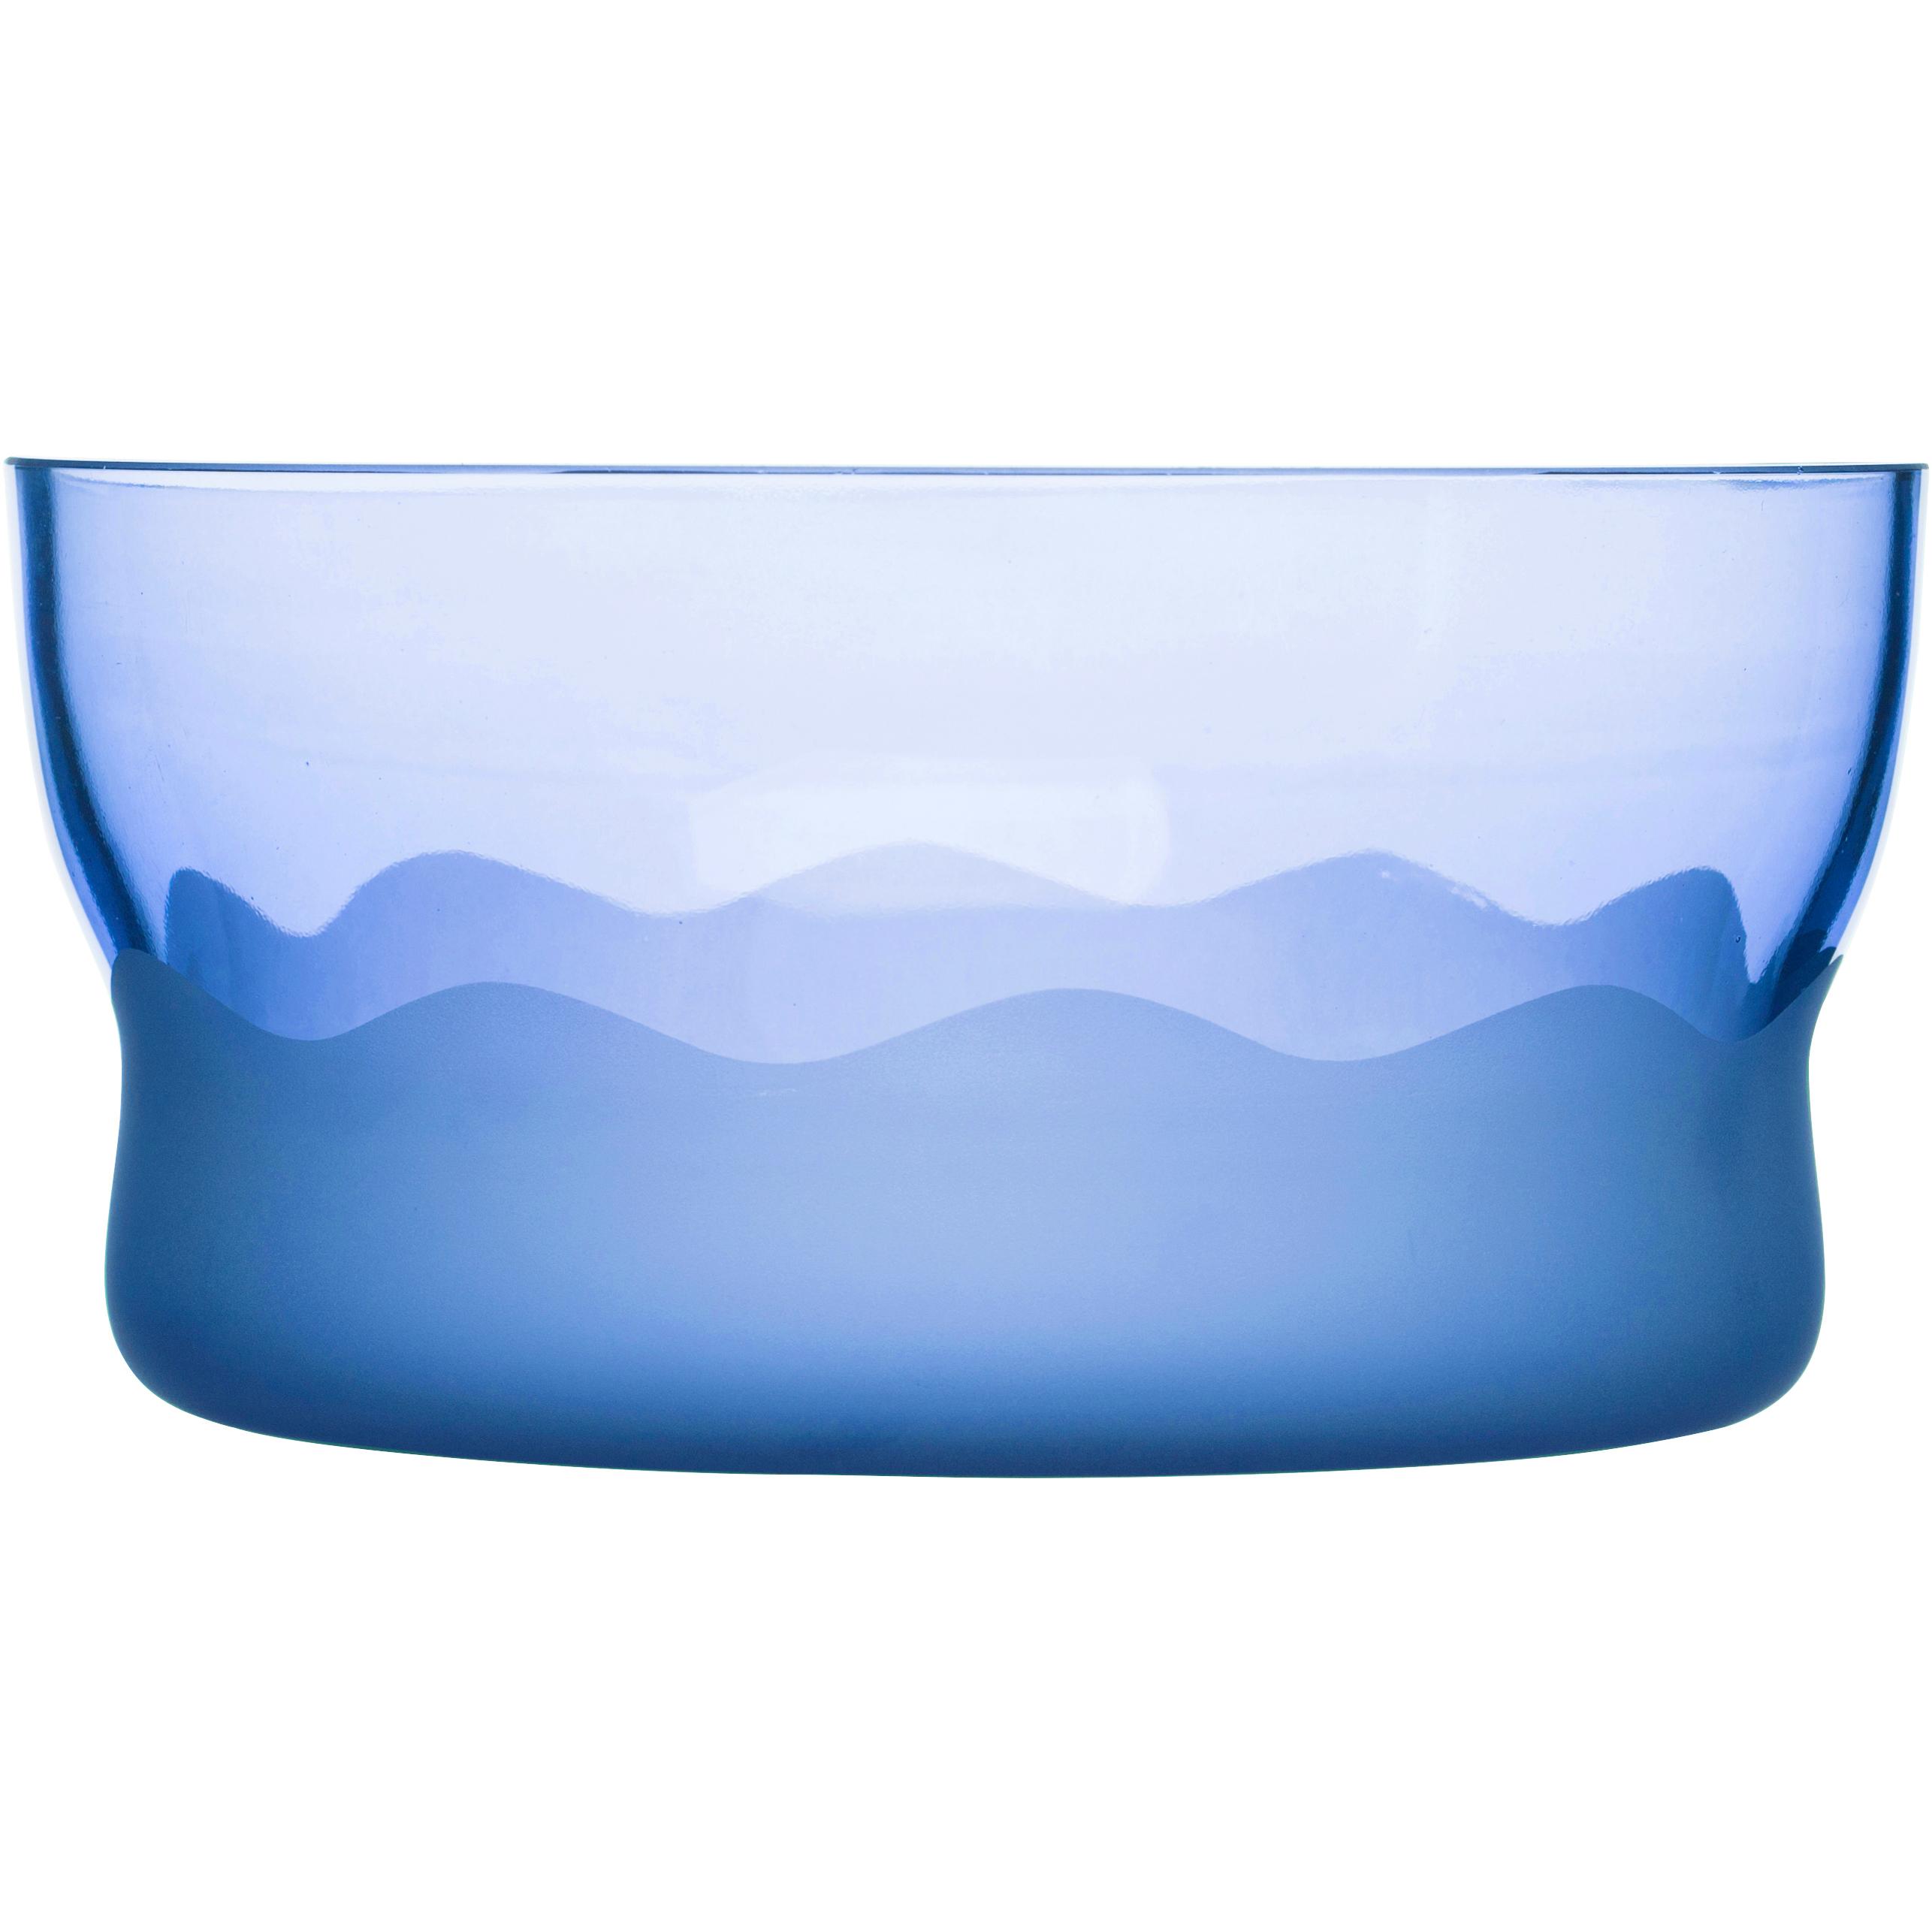 SEAglasbruk Aqua Wave Blue Glass Serving Bowl